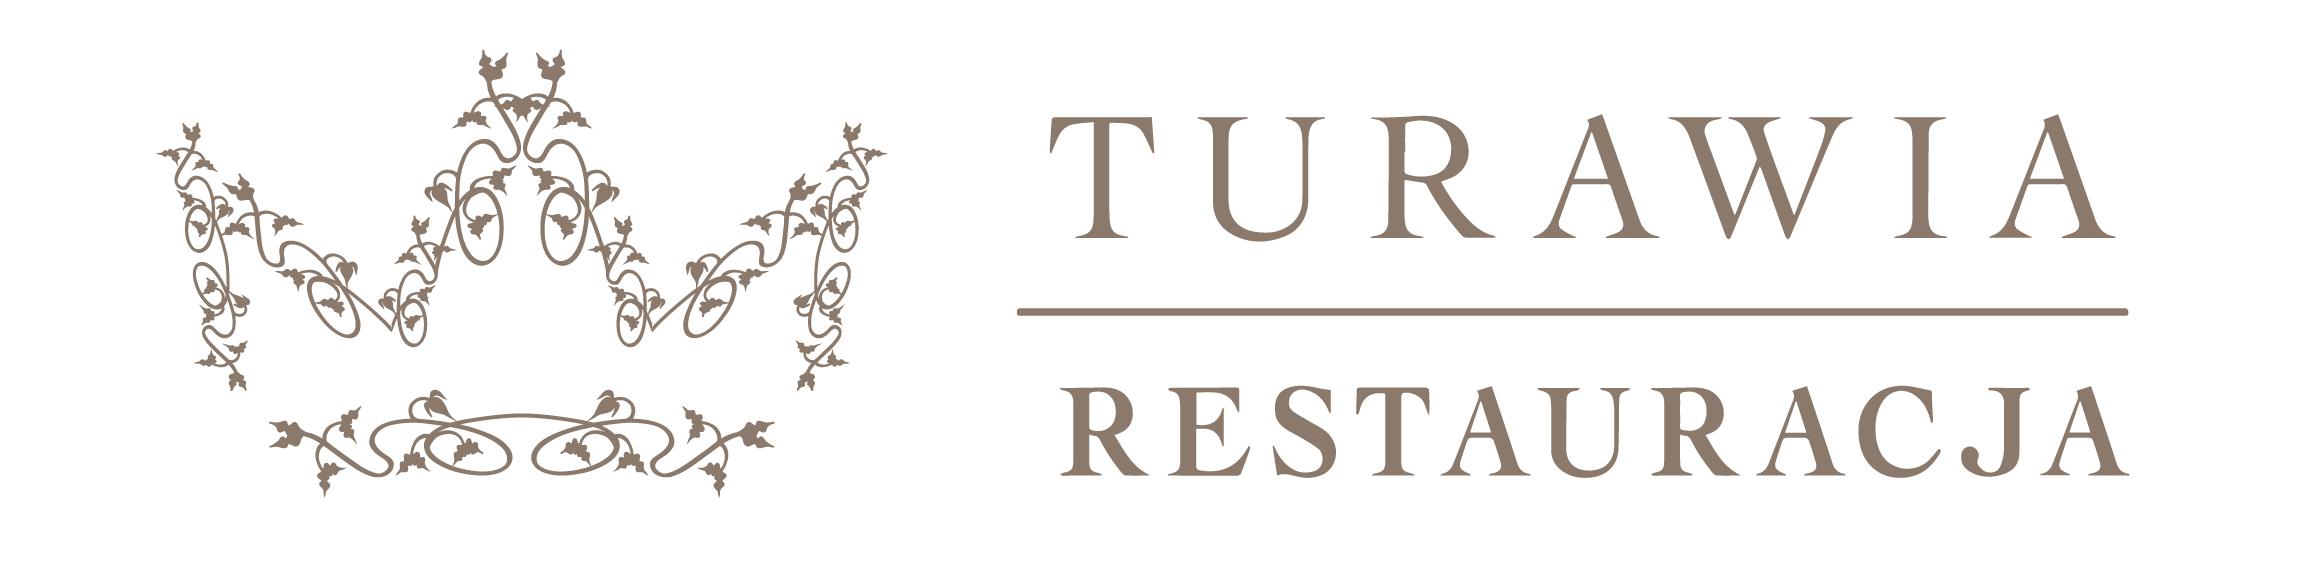 Turawia Hotel Restauracja